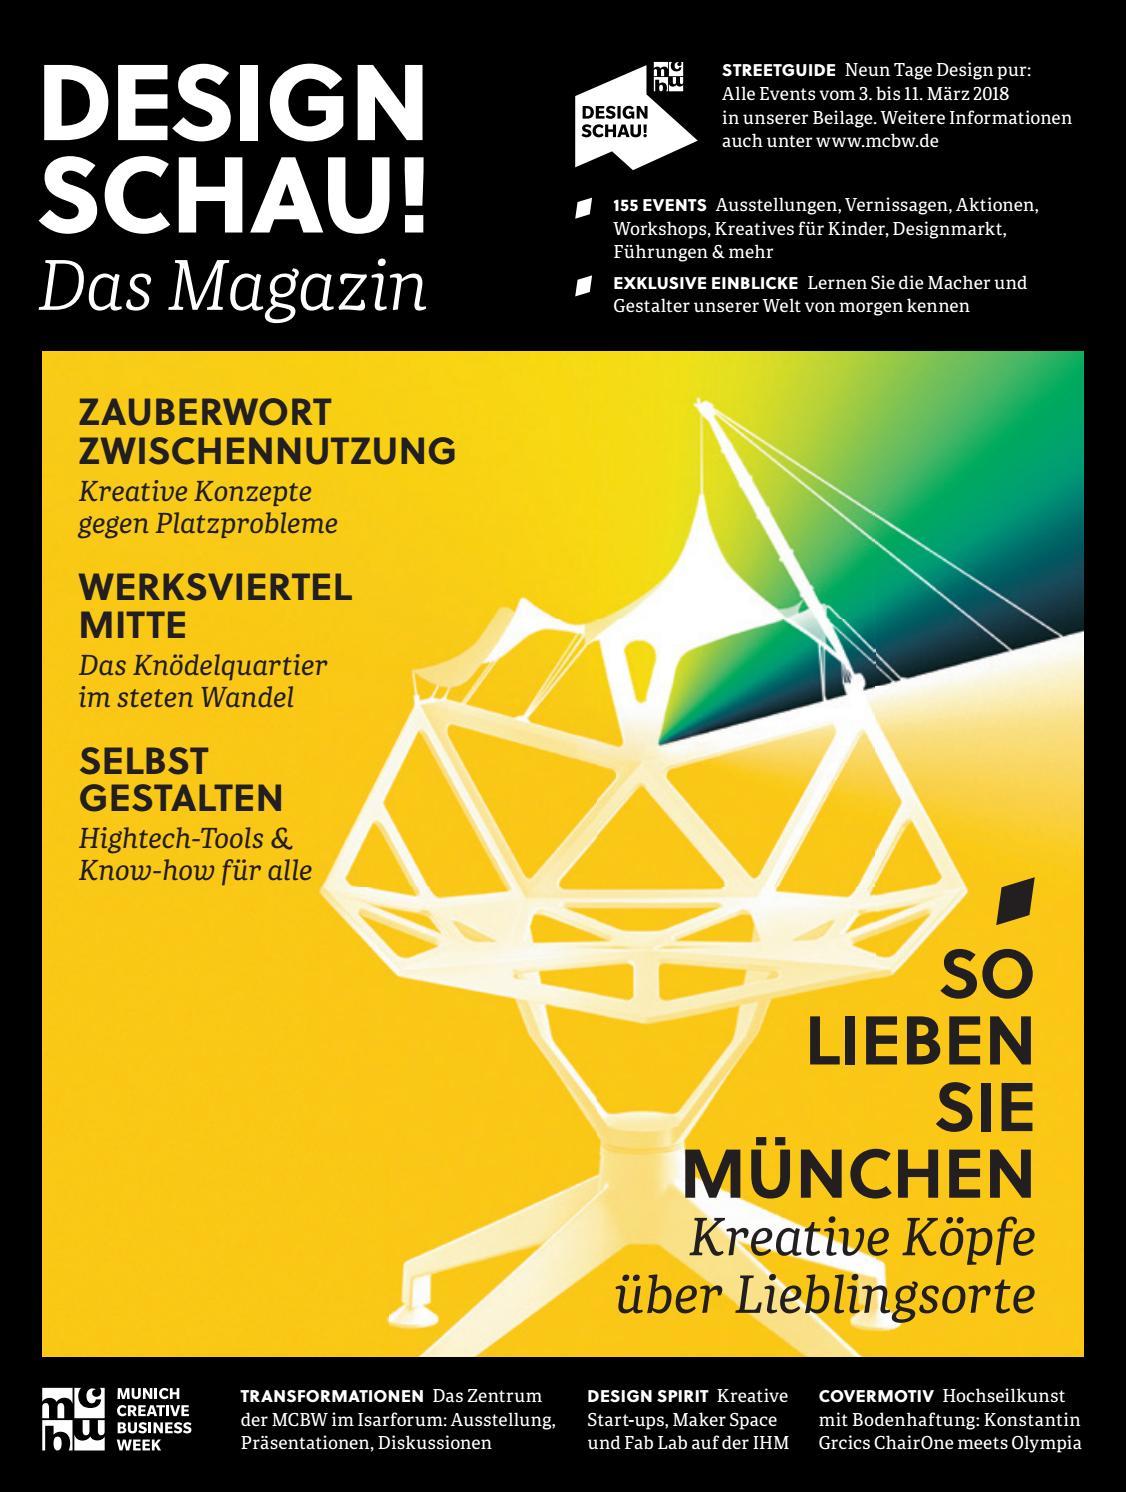 MCBW DESIGN SCHAU! Magazin by bayern design - issuu